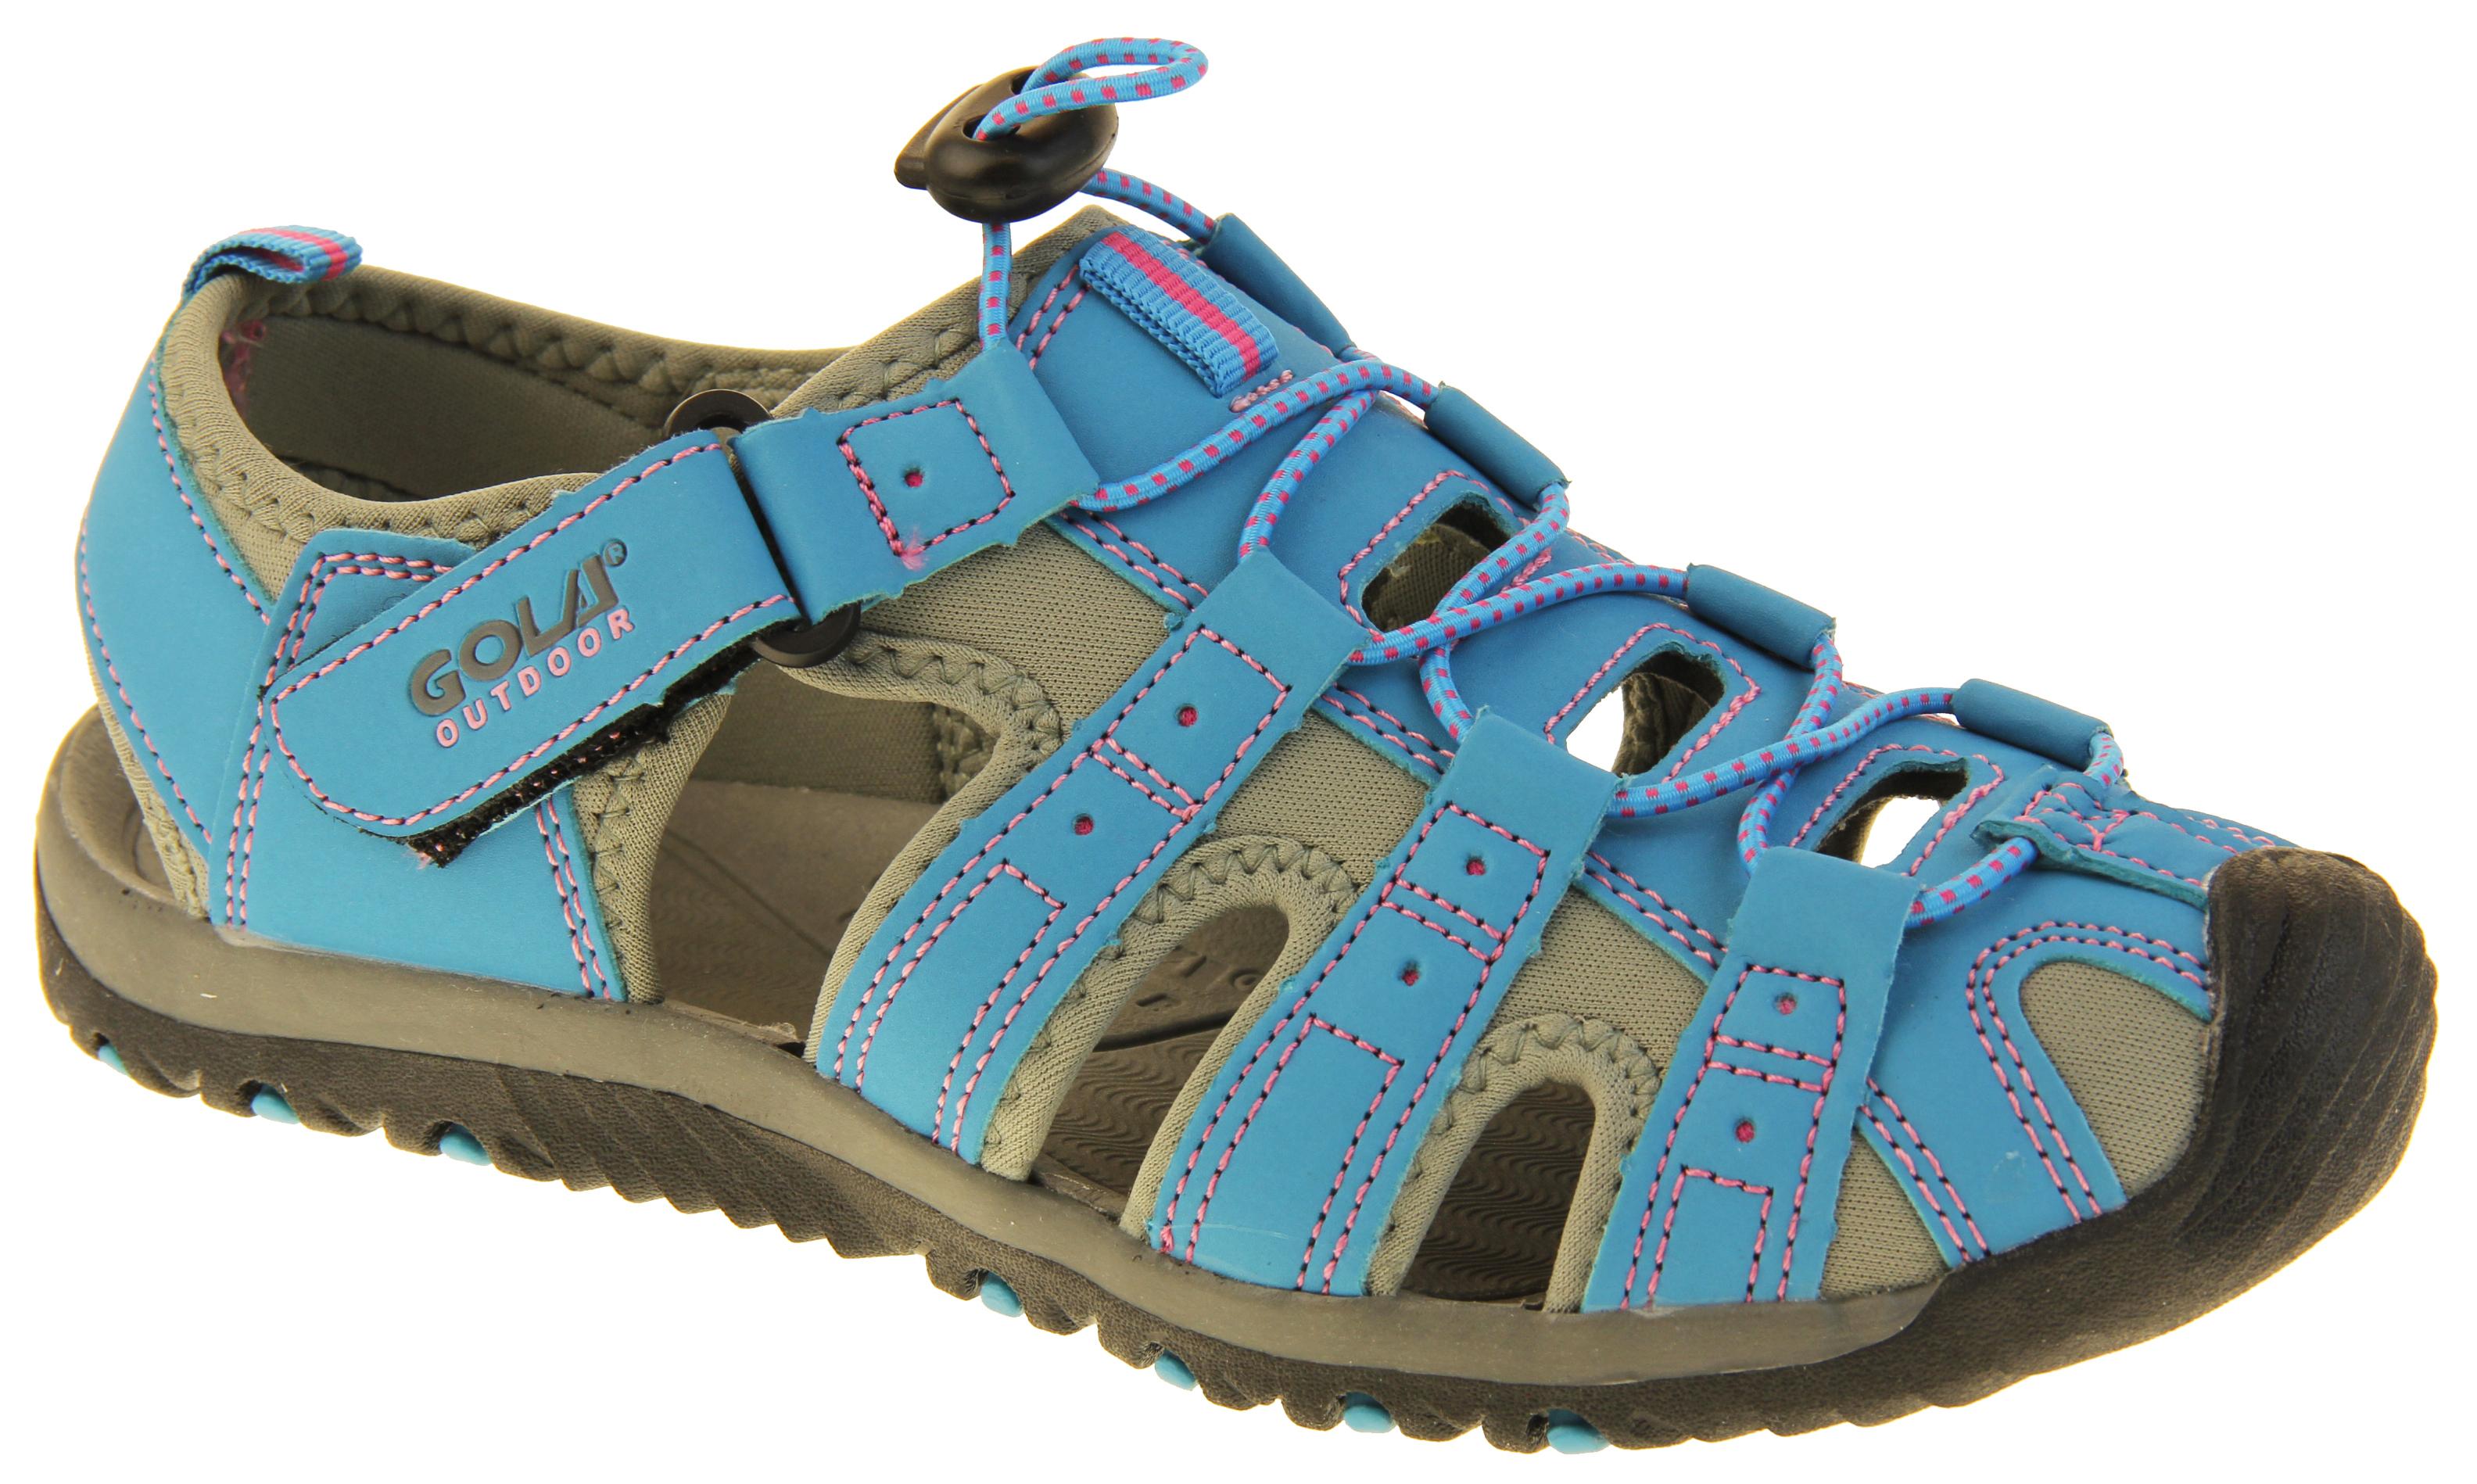 La s Outdoor Walking Sandals Womens Touch Fasten Summer Shoe Size